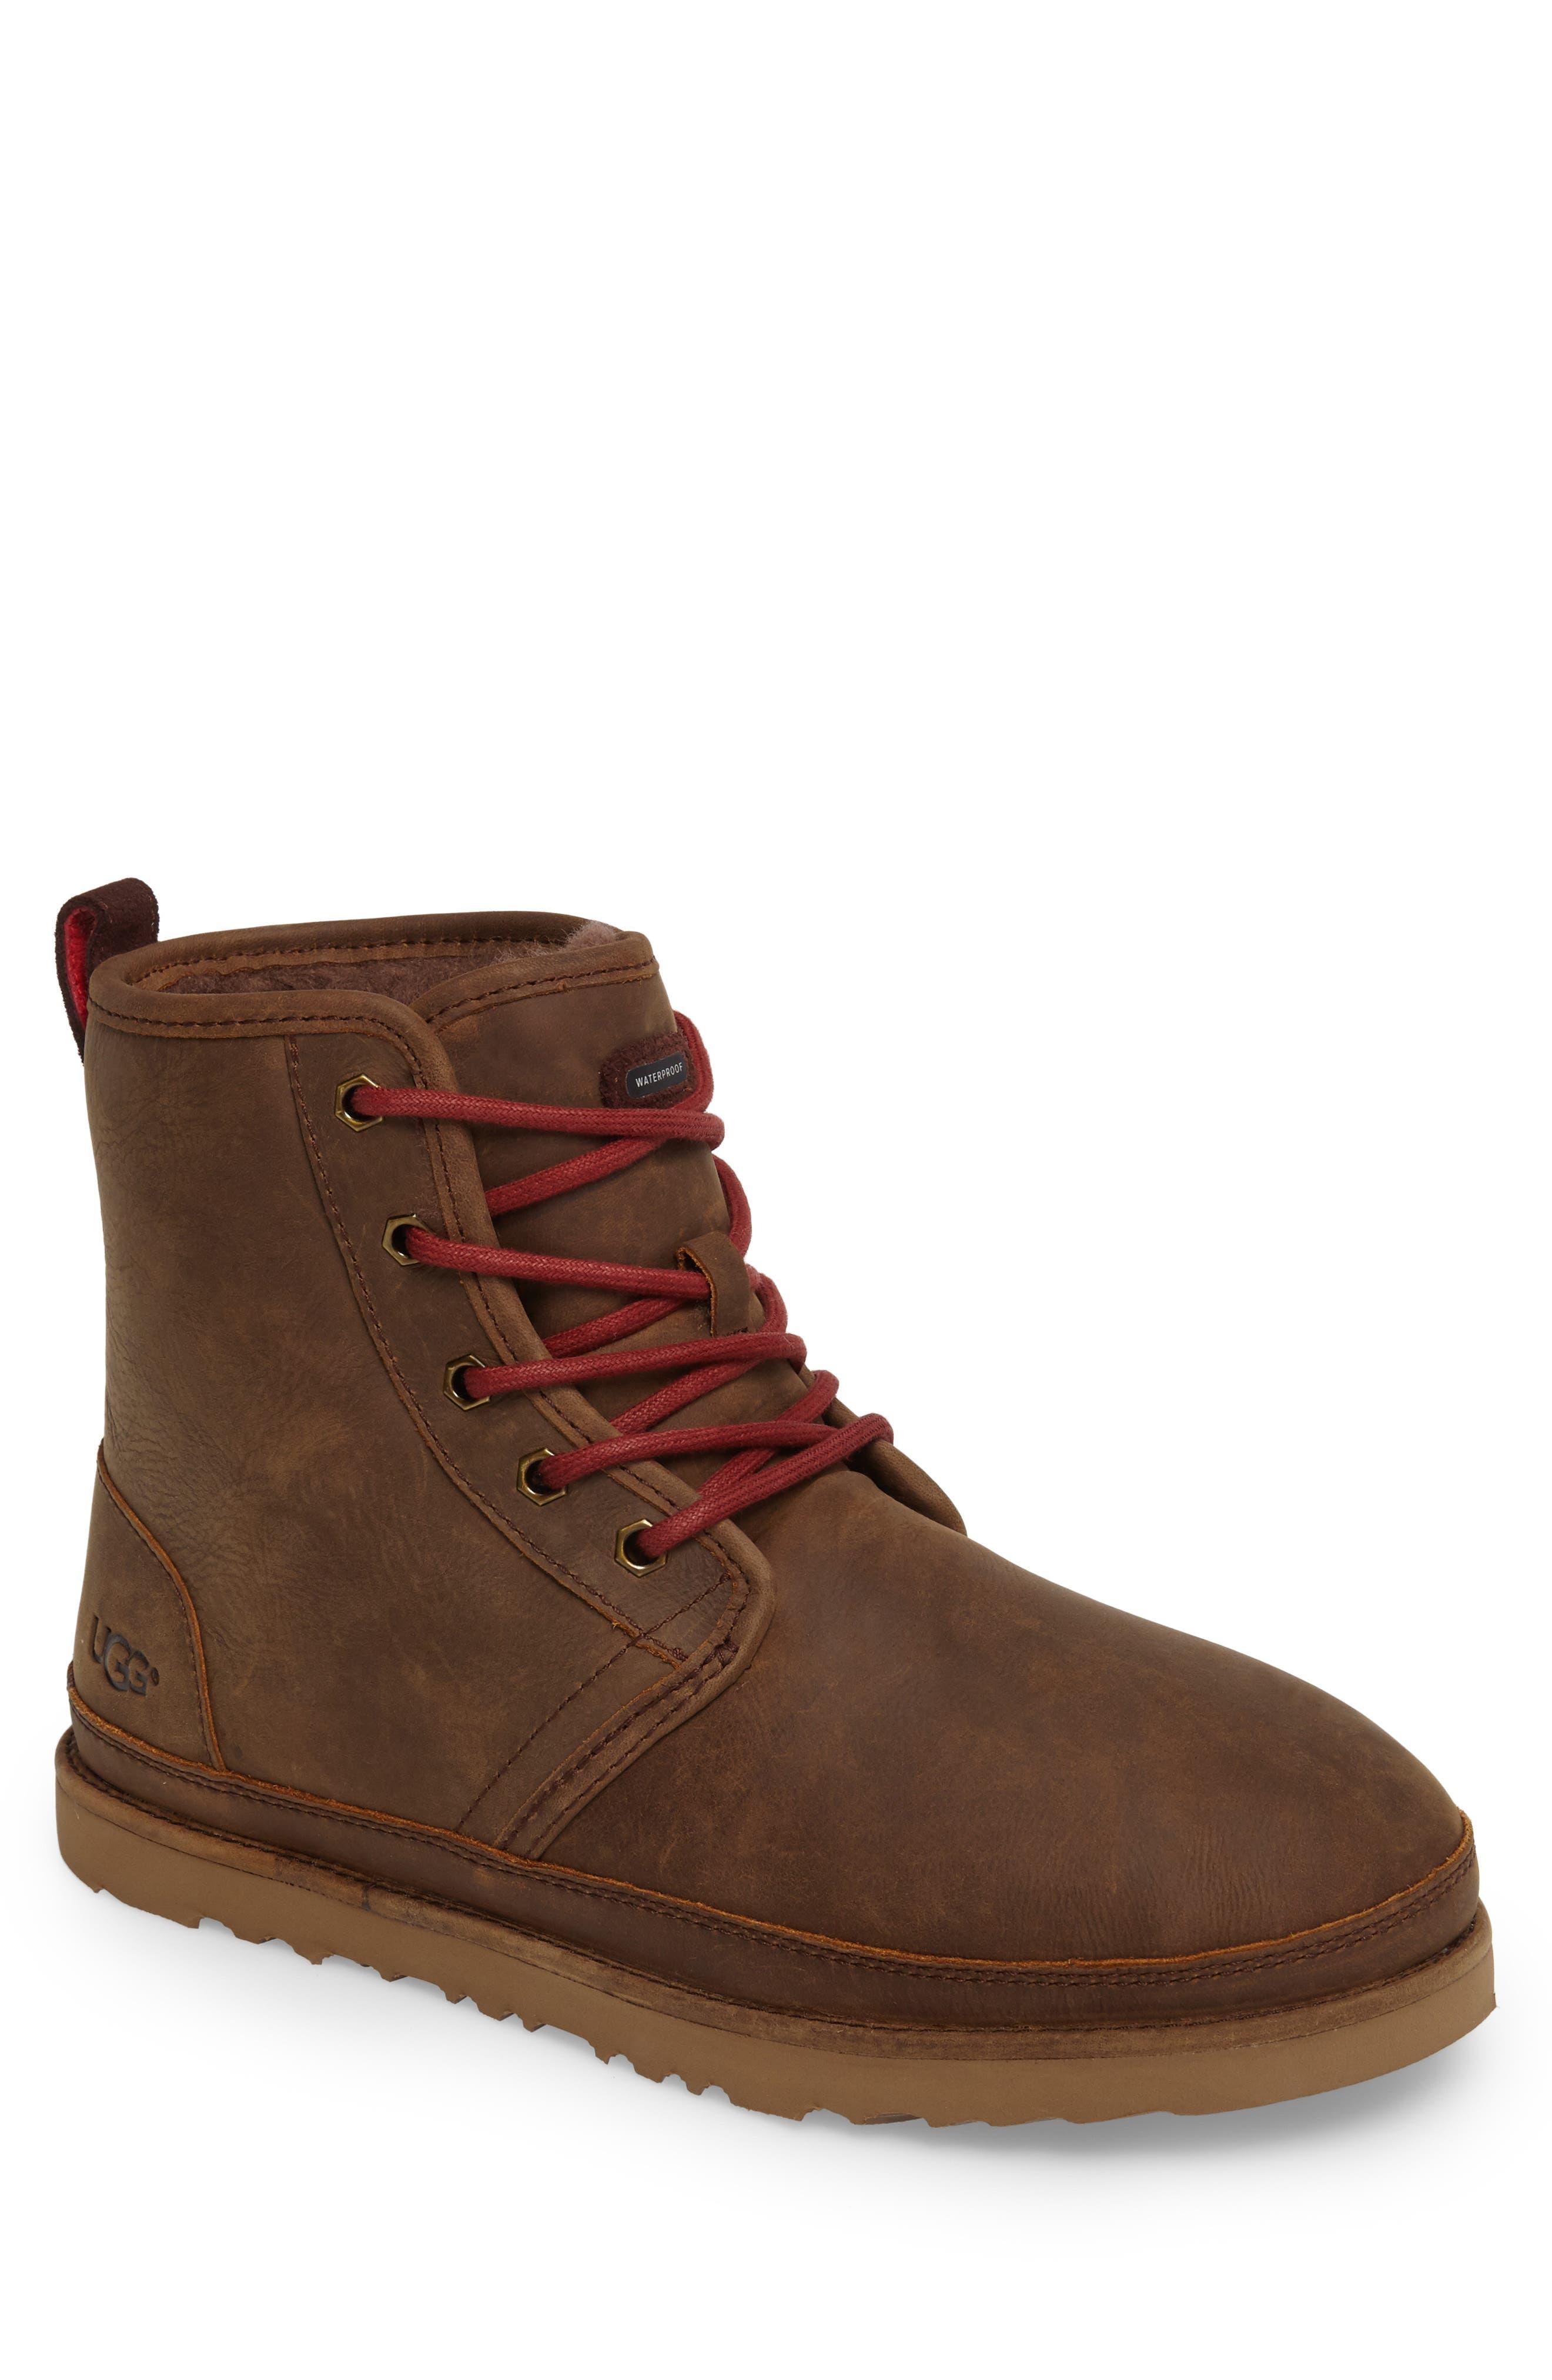 Alternate Image 1 Selected - UGG® Harkley Plain Toe Boot (Men)